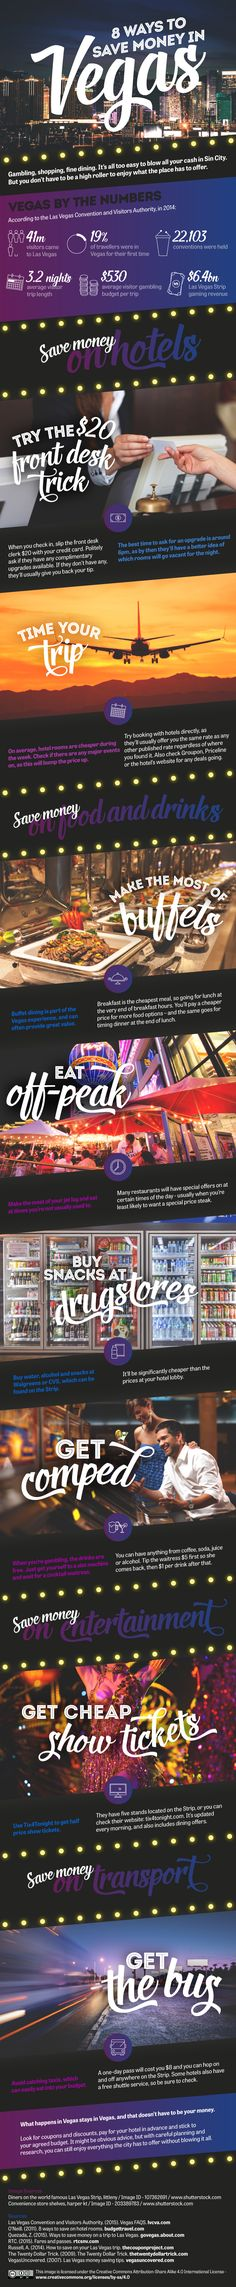 8 Ways to Save Money in #Vegas [INFOGRAPHIC] // Digital Remix //  #Infographic #VegasTips